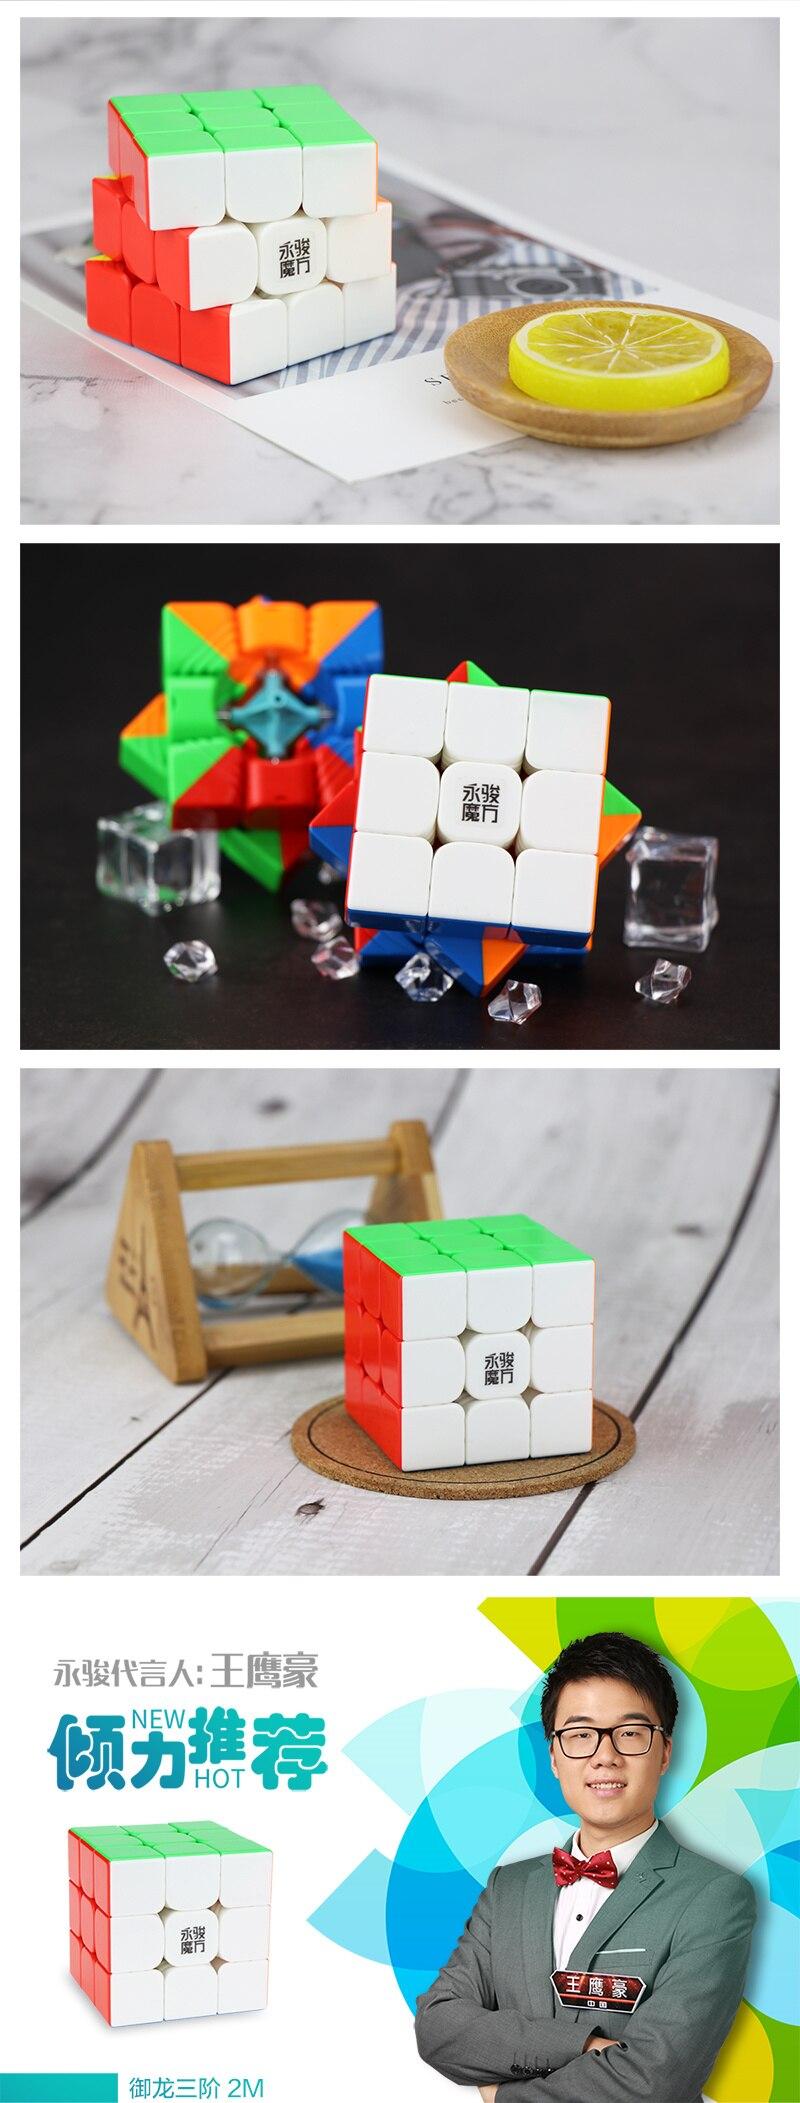 m 3x3x3 cubo mágico magnético profissional yulong